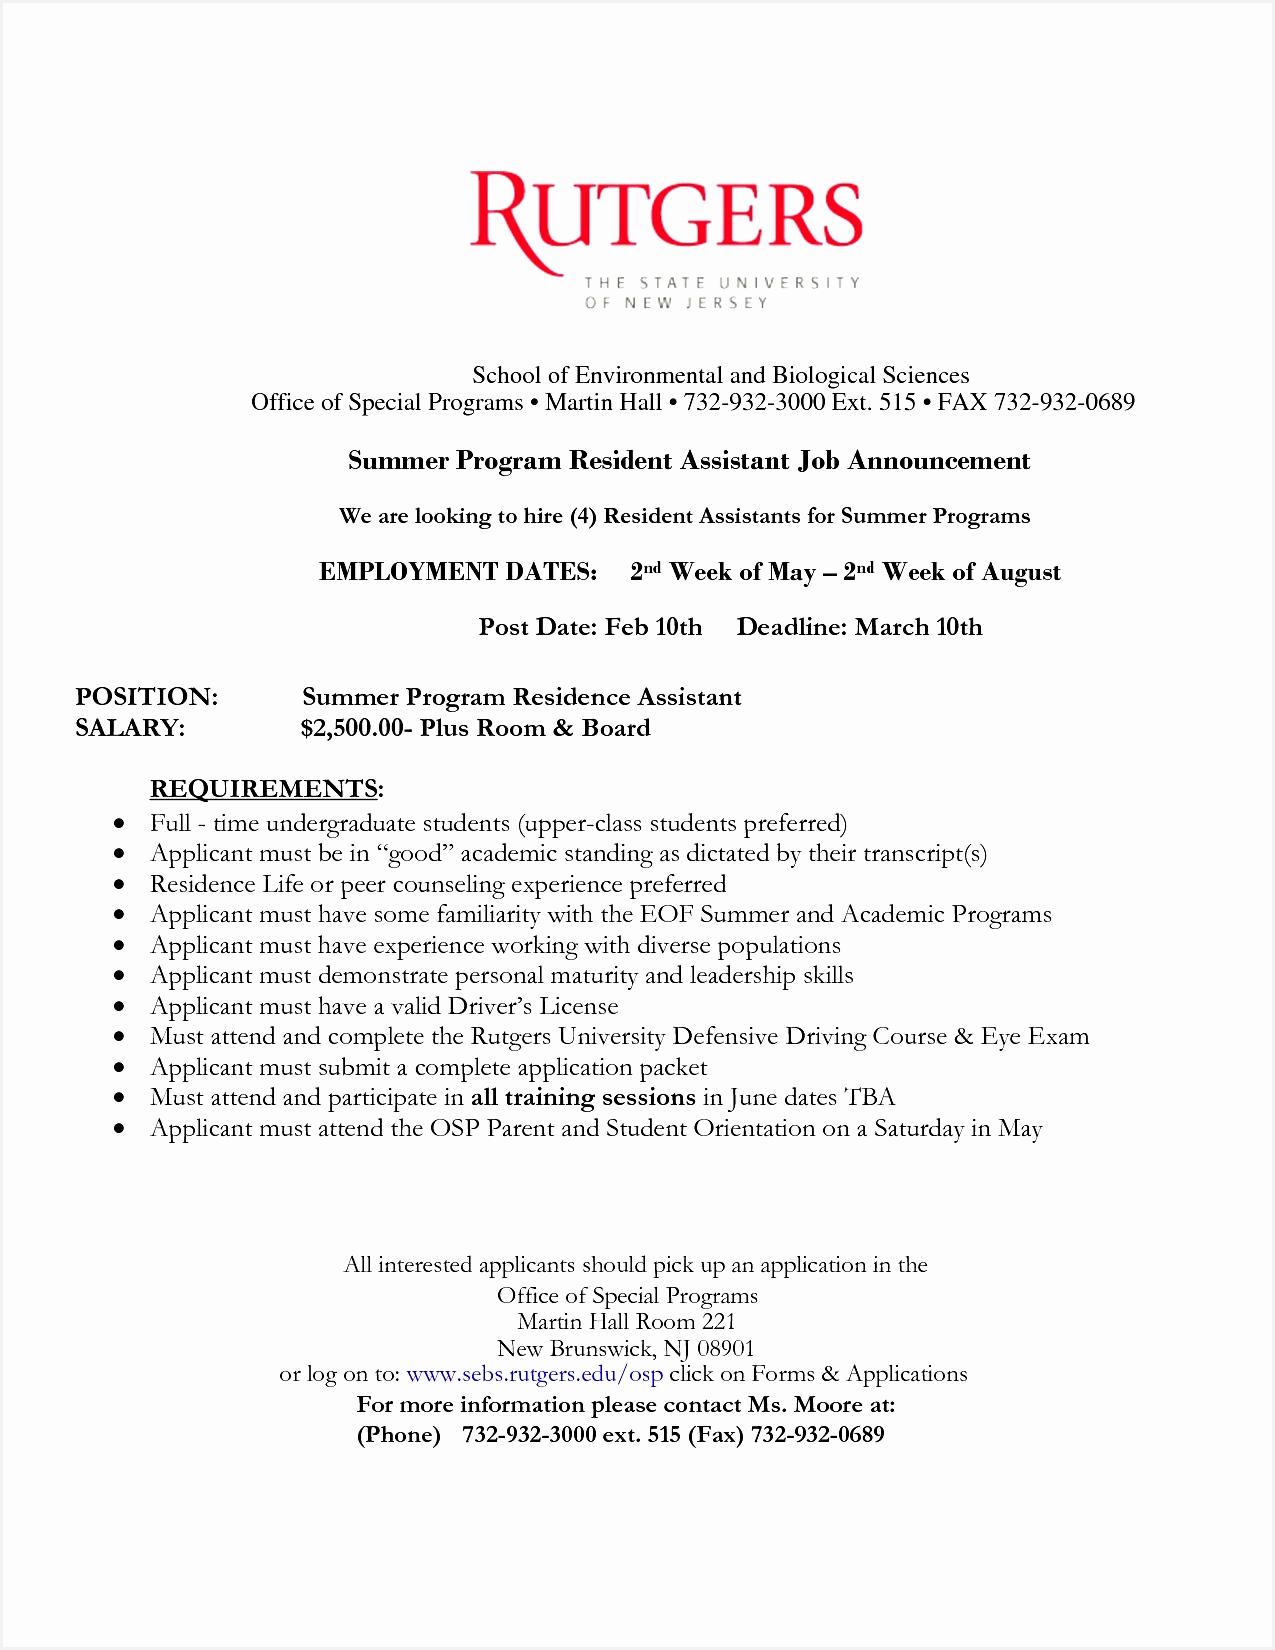 resident assistant resume resume template Pinterest16501275